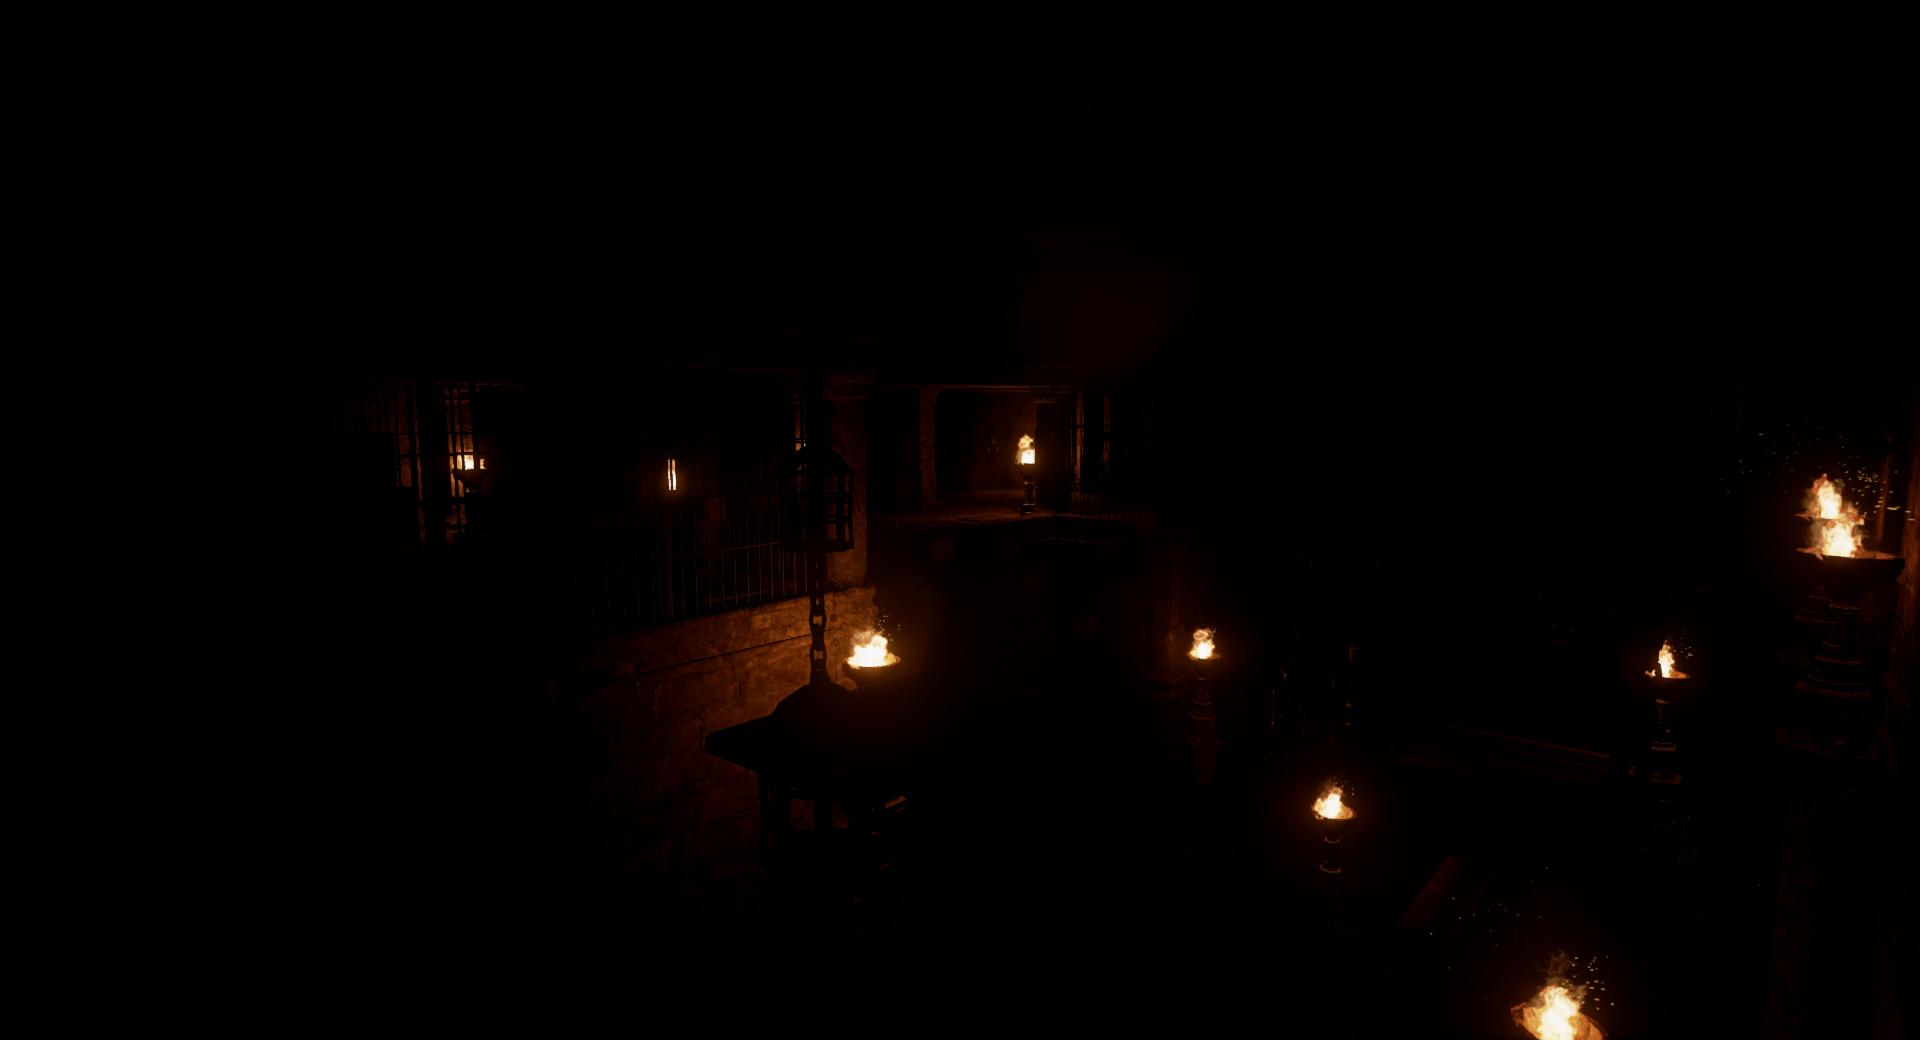 New Room Screenshot 3/3